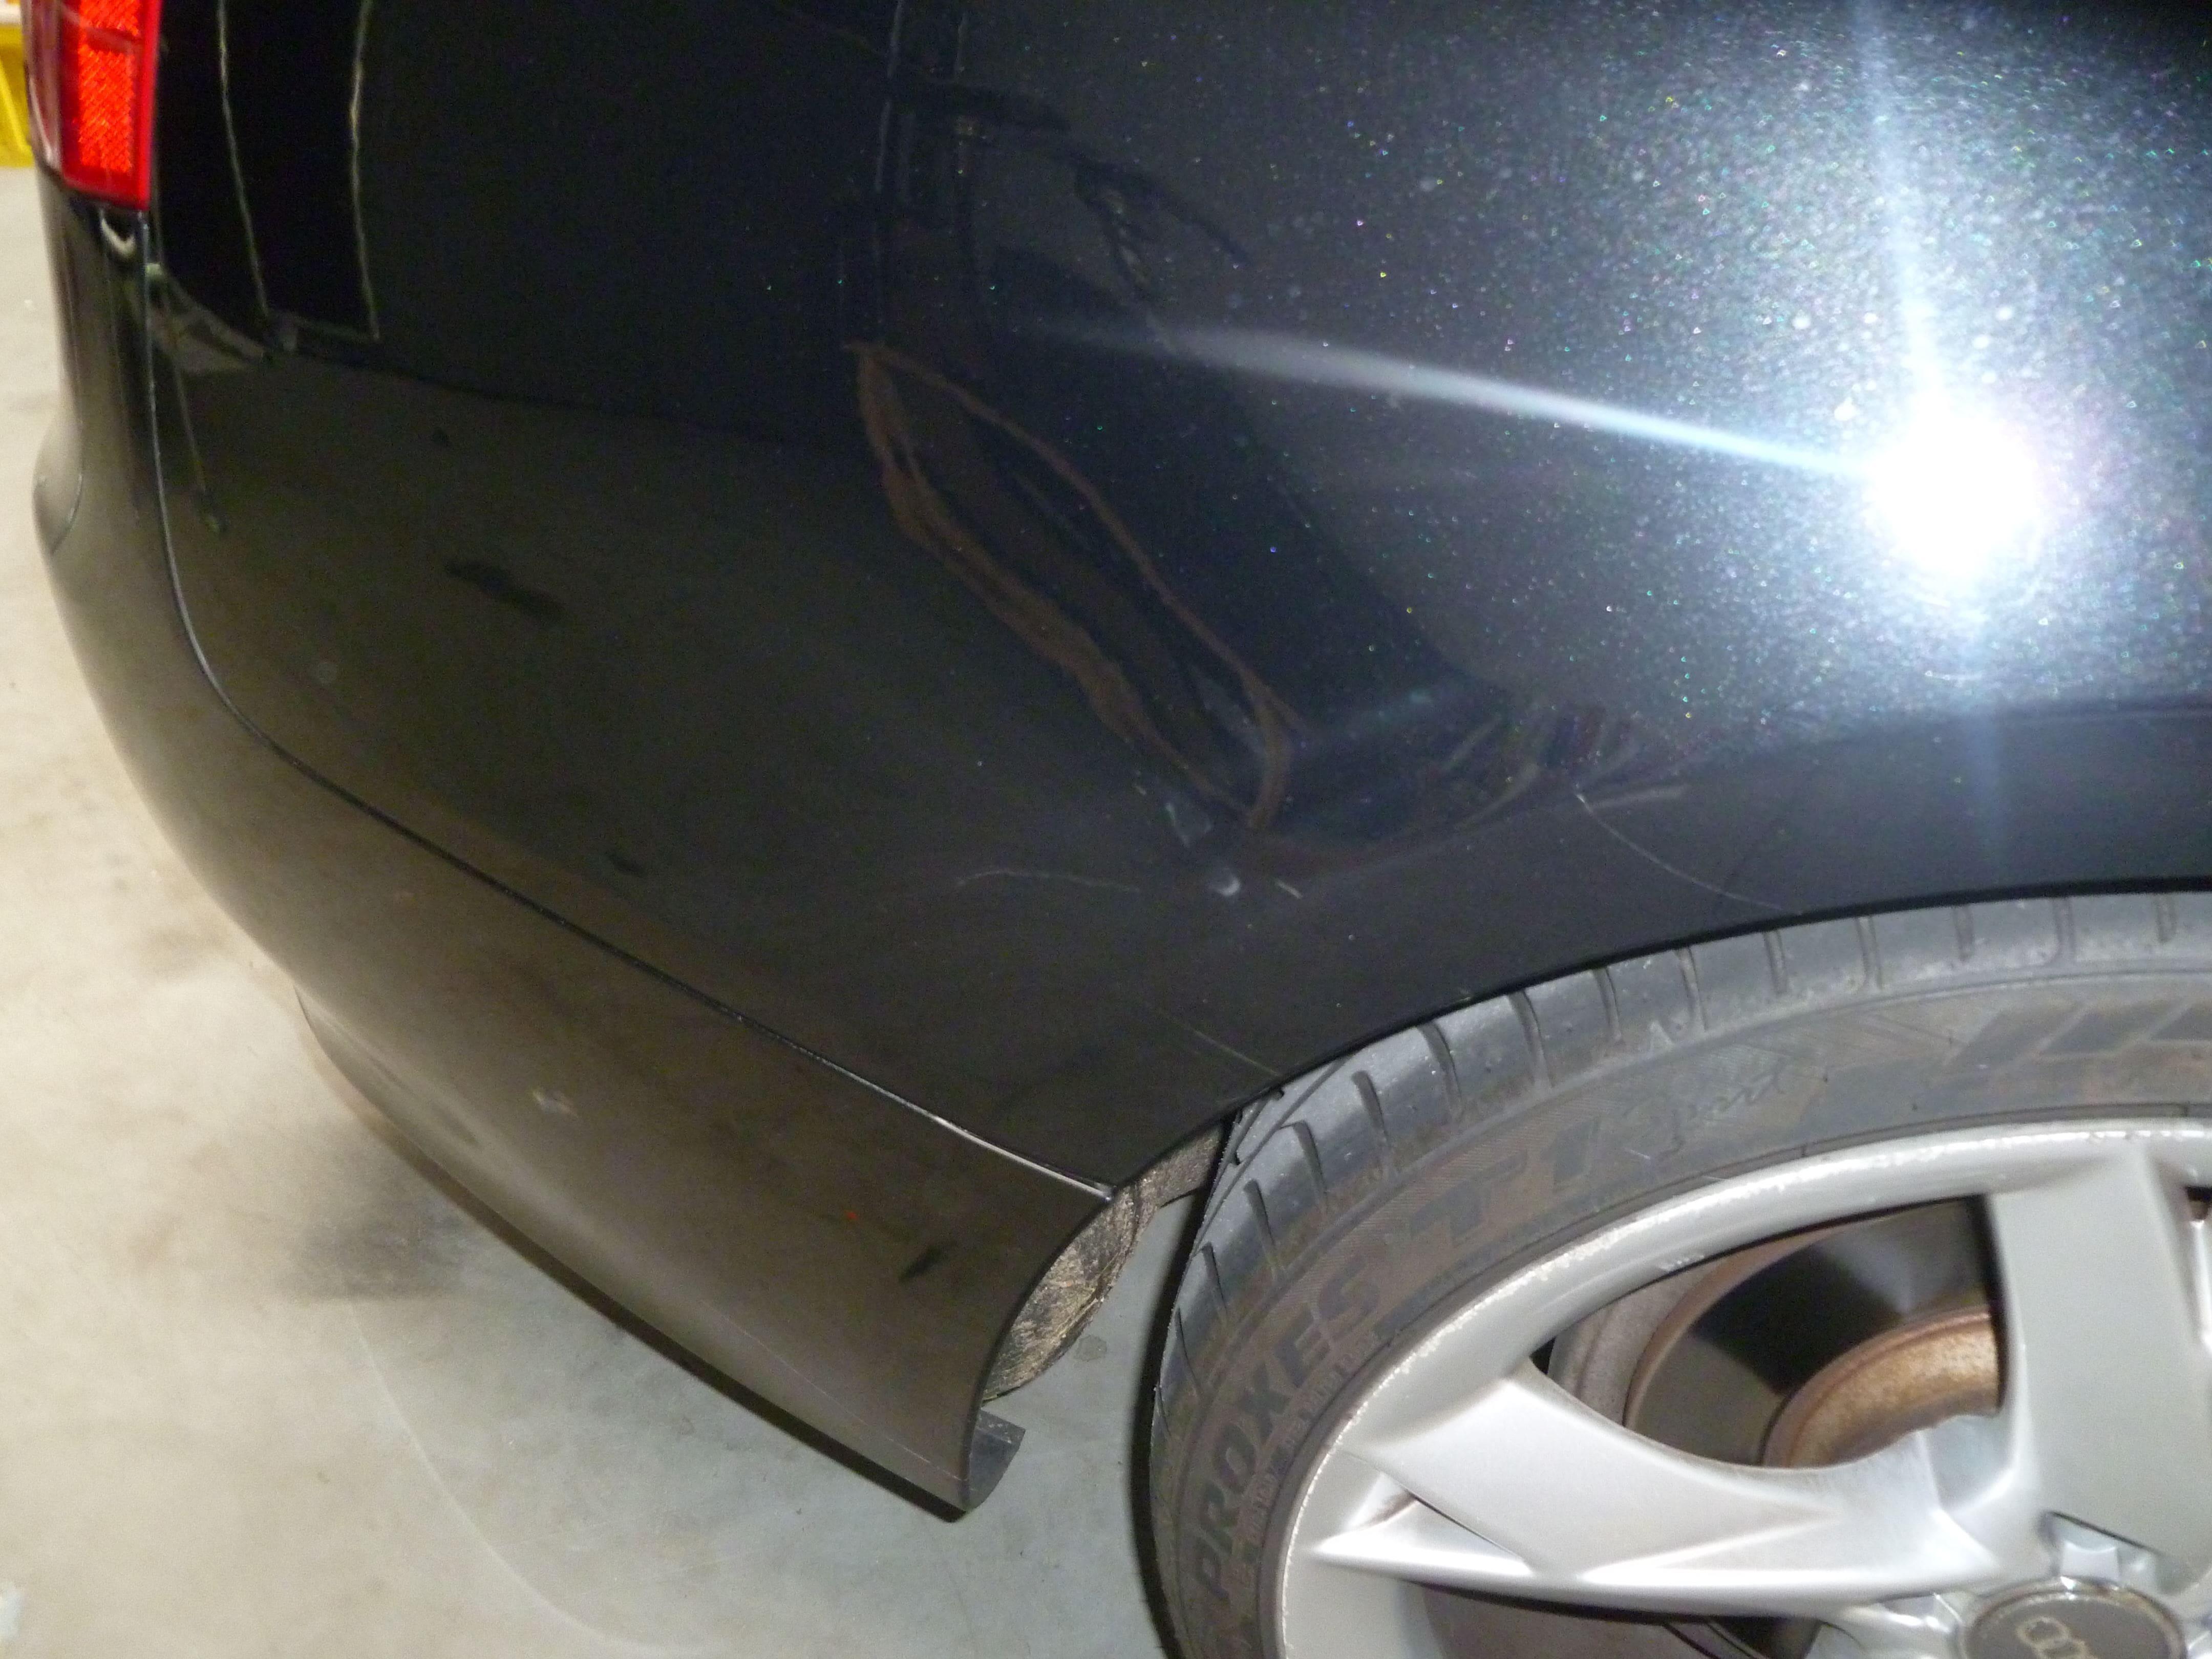 Audi A5 coupe met Metallic Witte Wrap, Carwrapping door Wrapmyride.nu Foto-nr:4674, ©2021